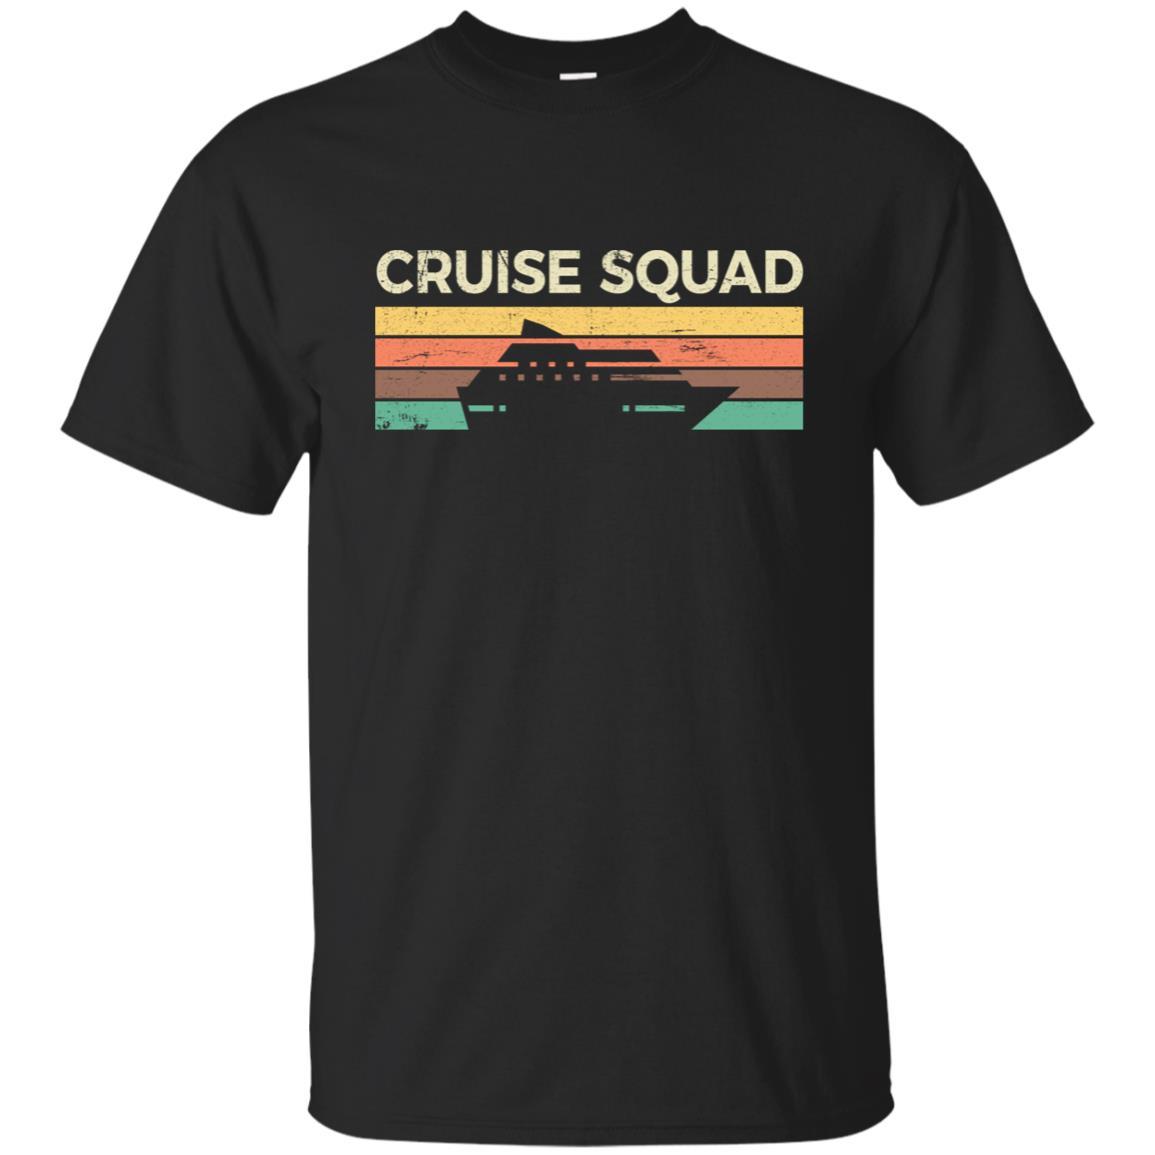 Cruise Funny Family and Groups Unisex Short Sleeve